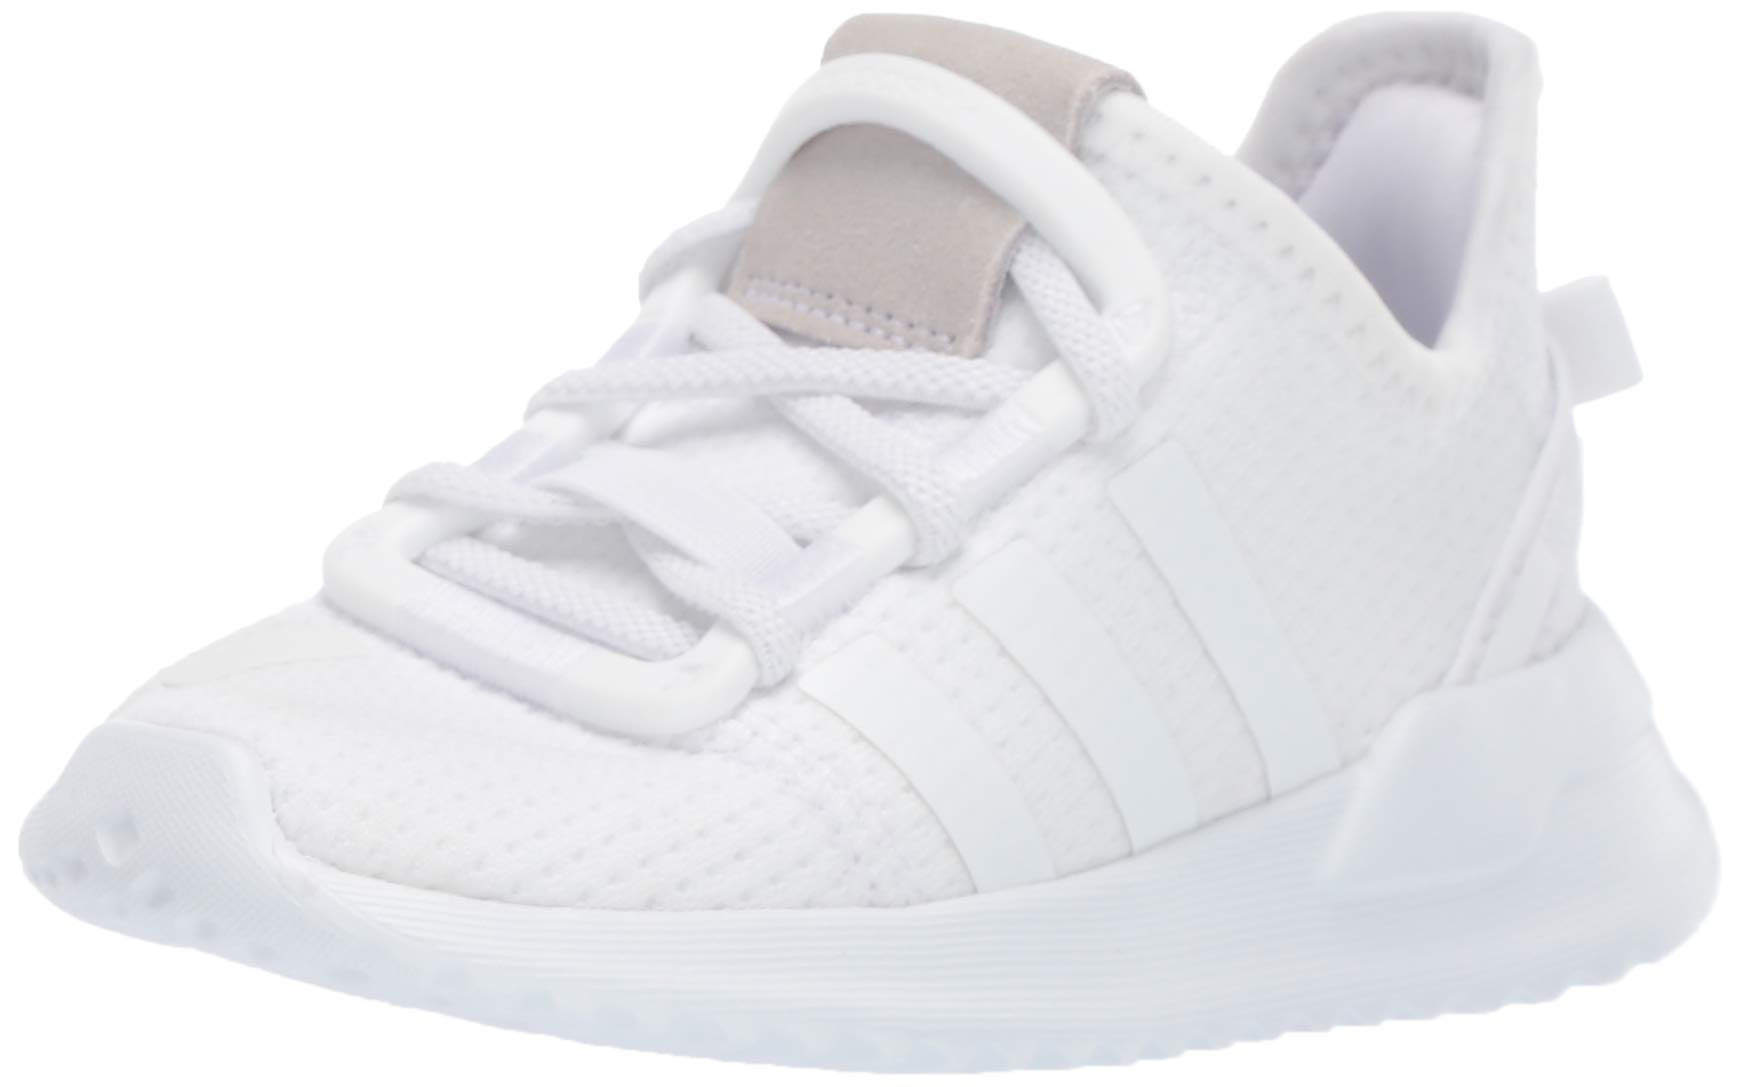 adidas Originals Baby U_Path Running Shoe White, 5.5K M US Toddler by adidas Originals (Image #1)